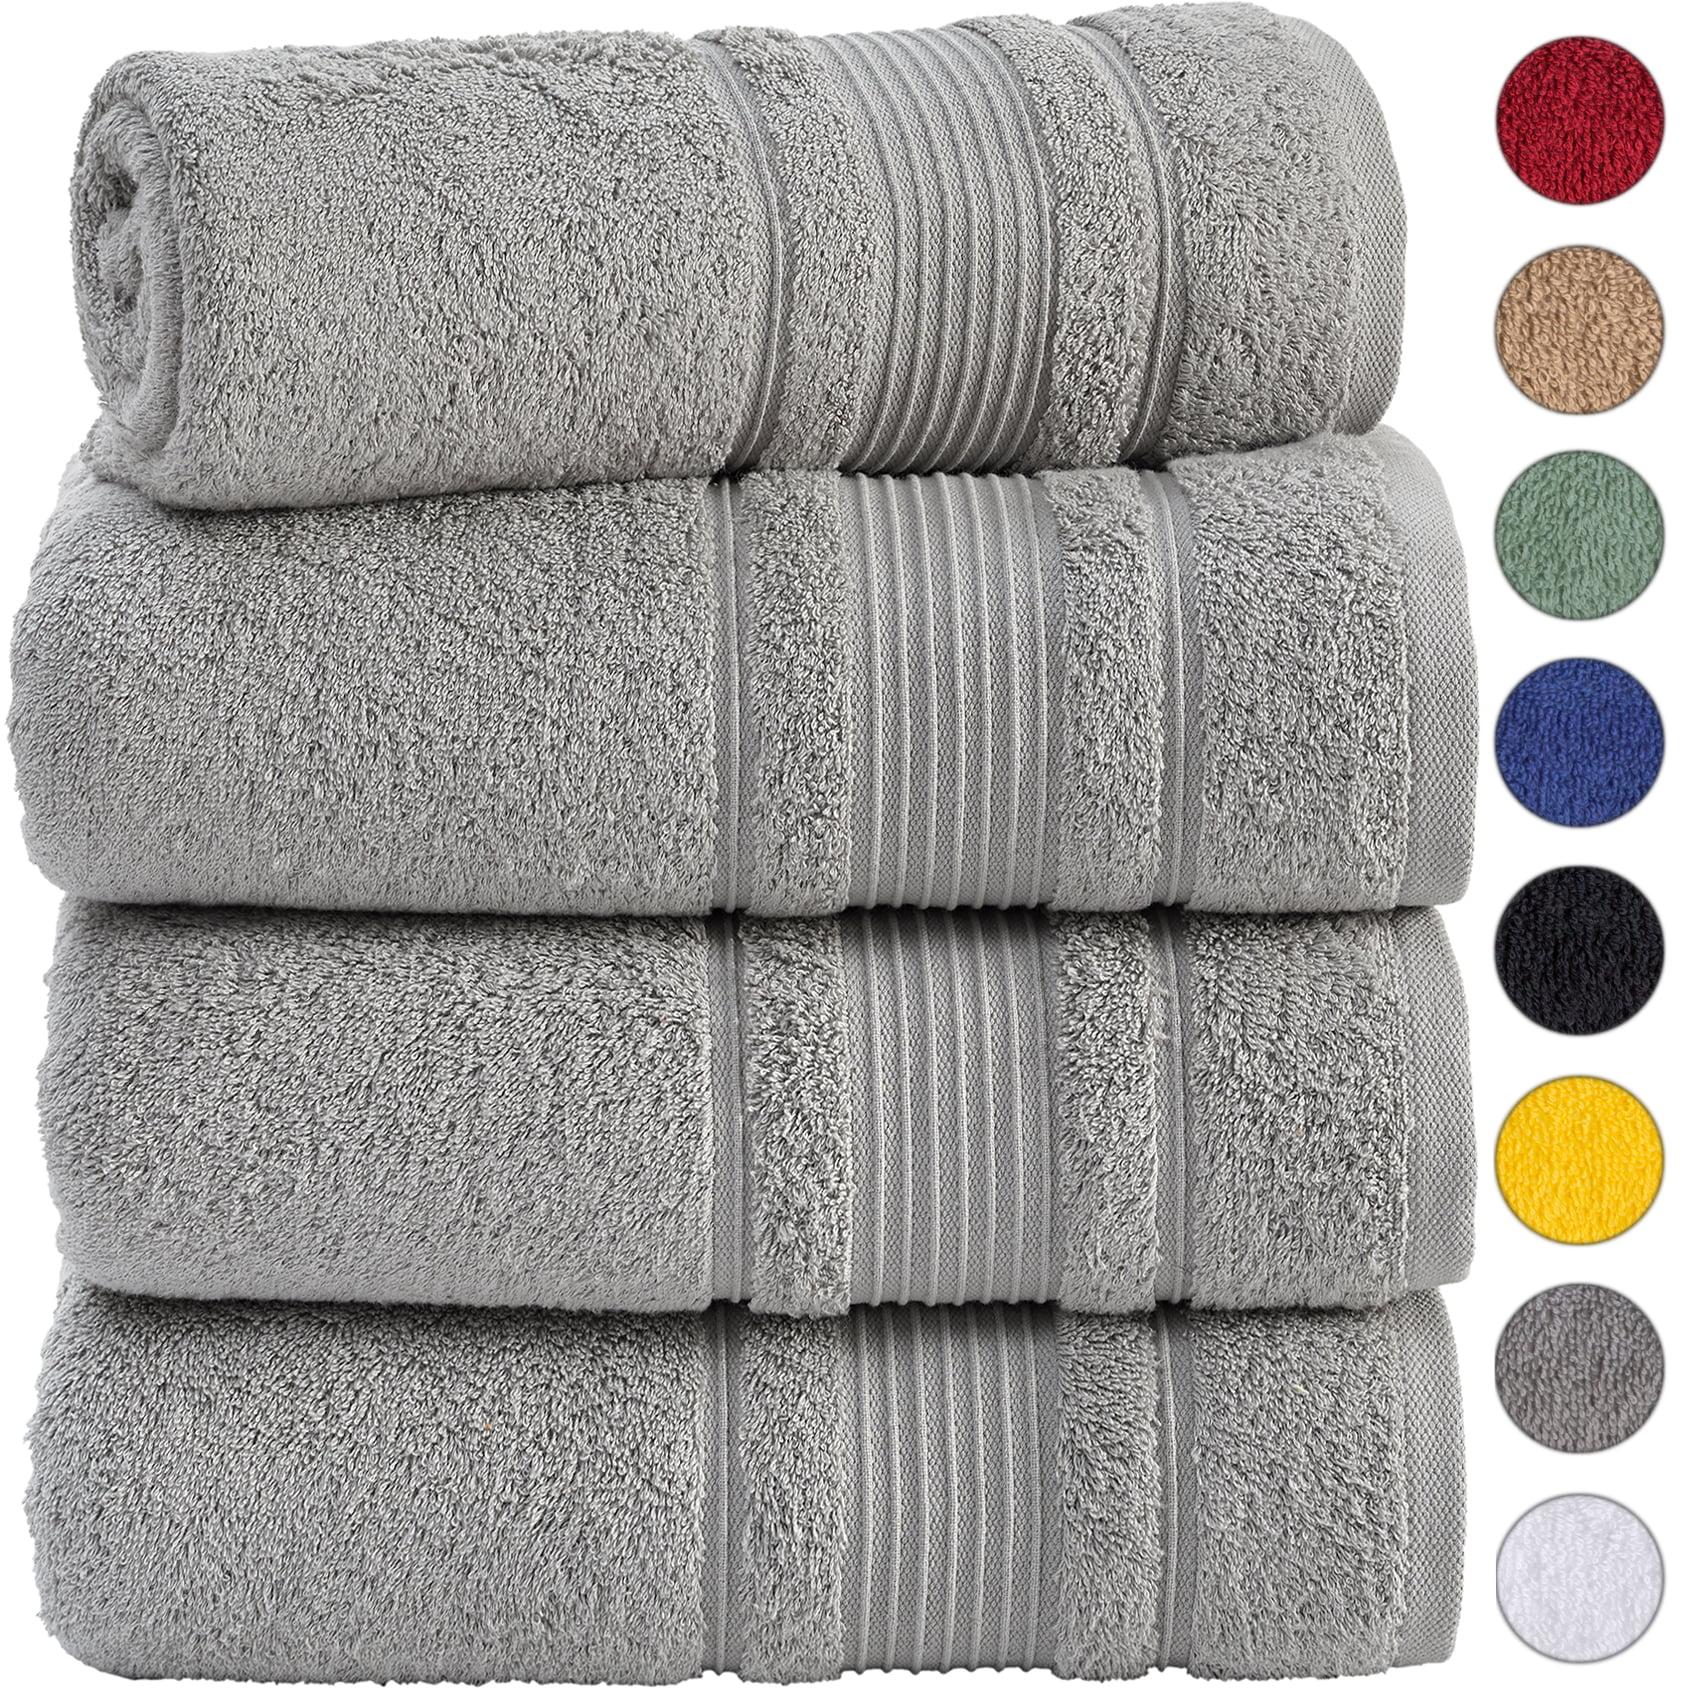 4 Piece Bath Towels Set For Bathroom Spa Hotel Quality 100 Cotton Turkish Towels Absorbent Soft And Eco Friendly Grey Walmart Com Walmart Com